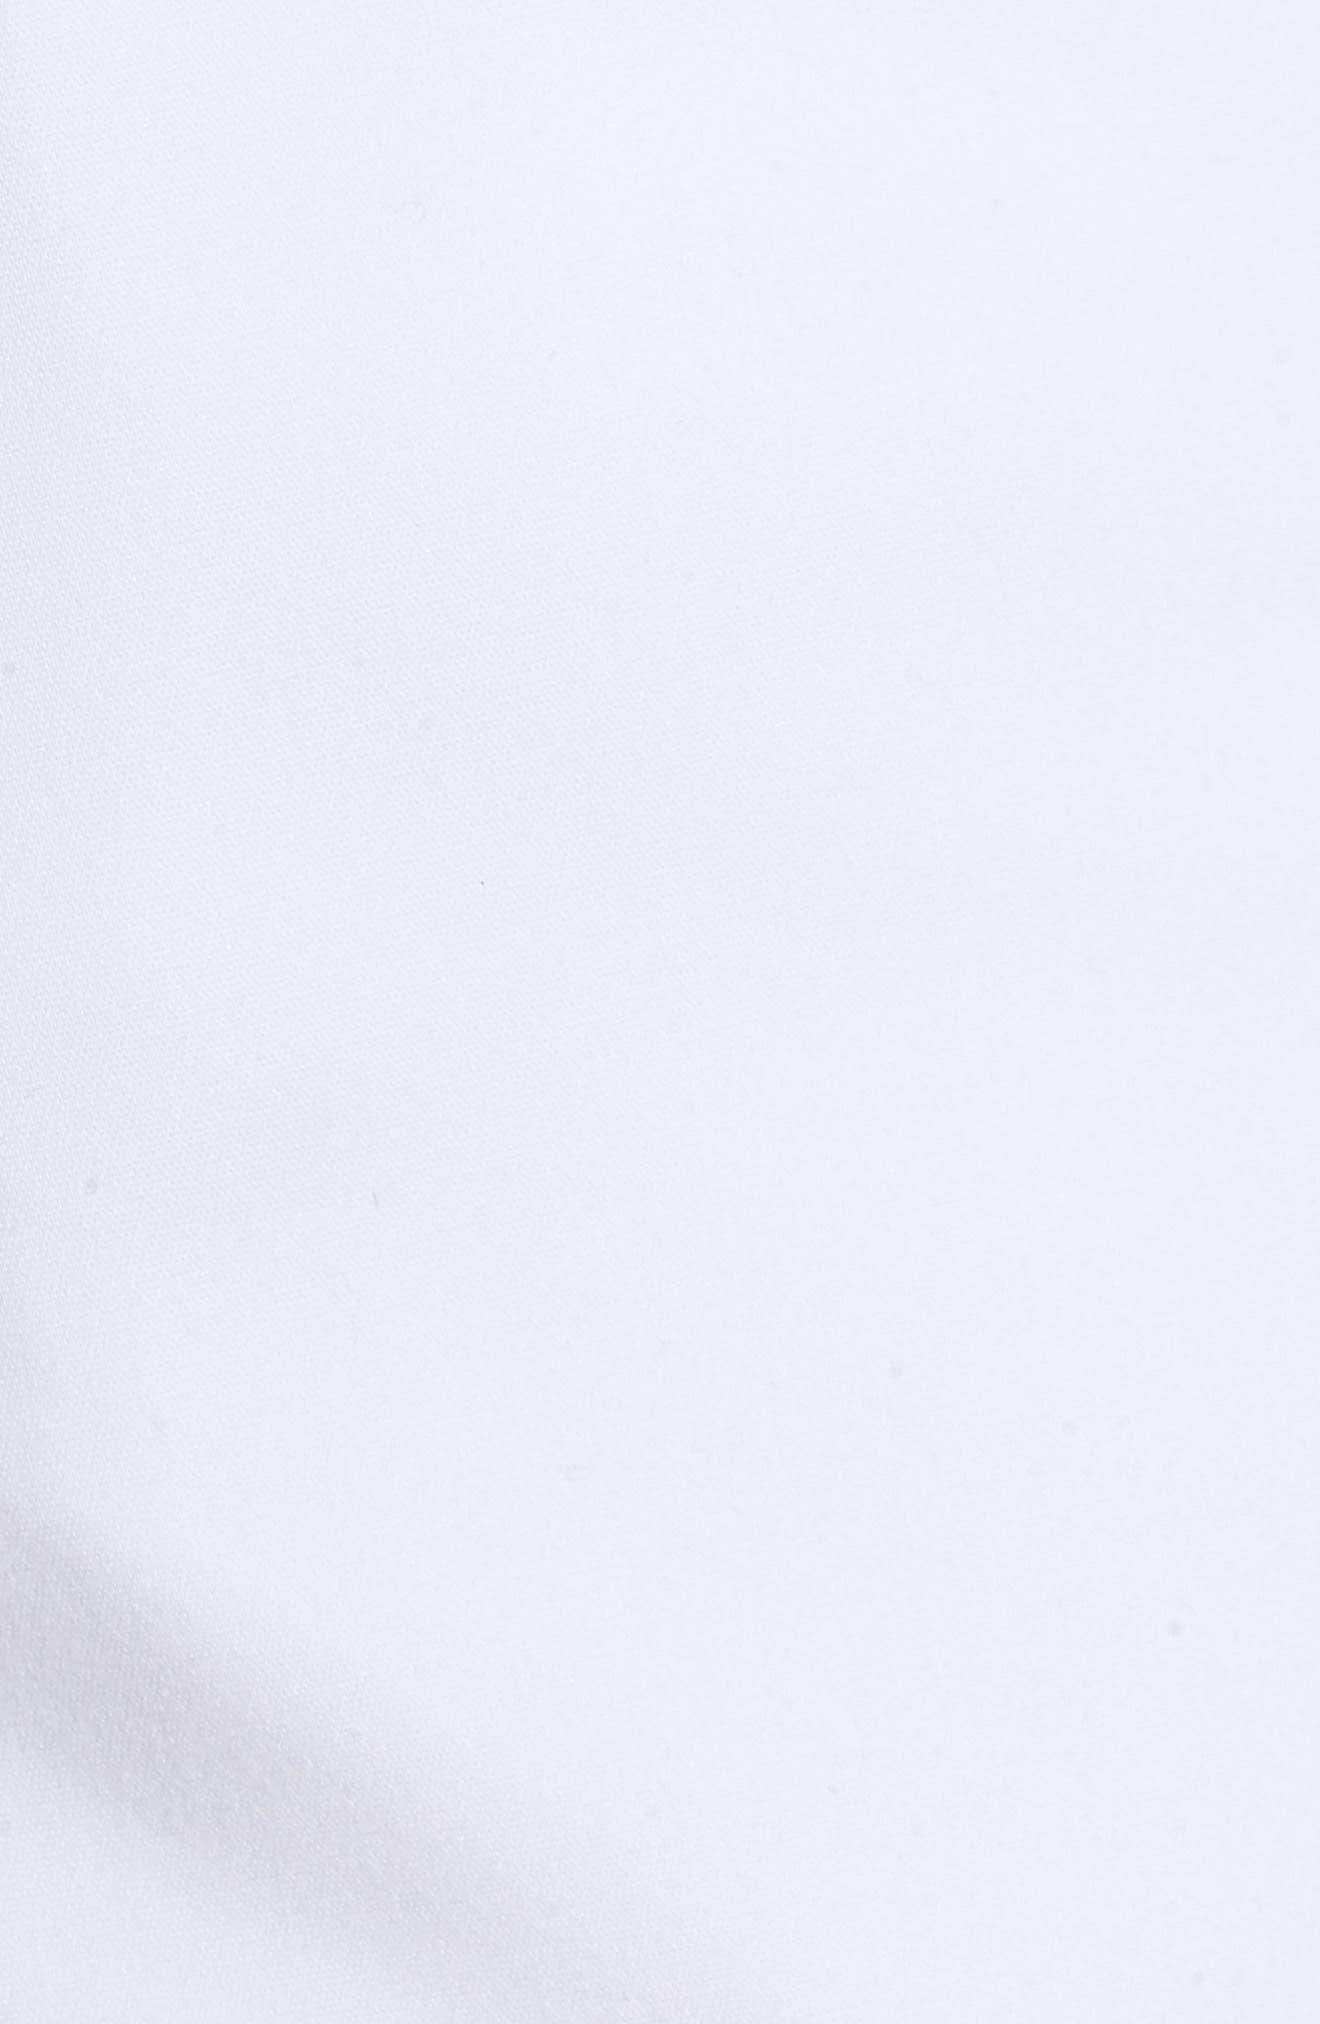 Park South Shorts,                             Alternate thumbnail 5, color,                             100